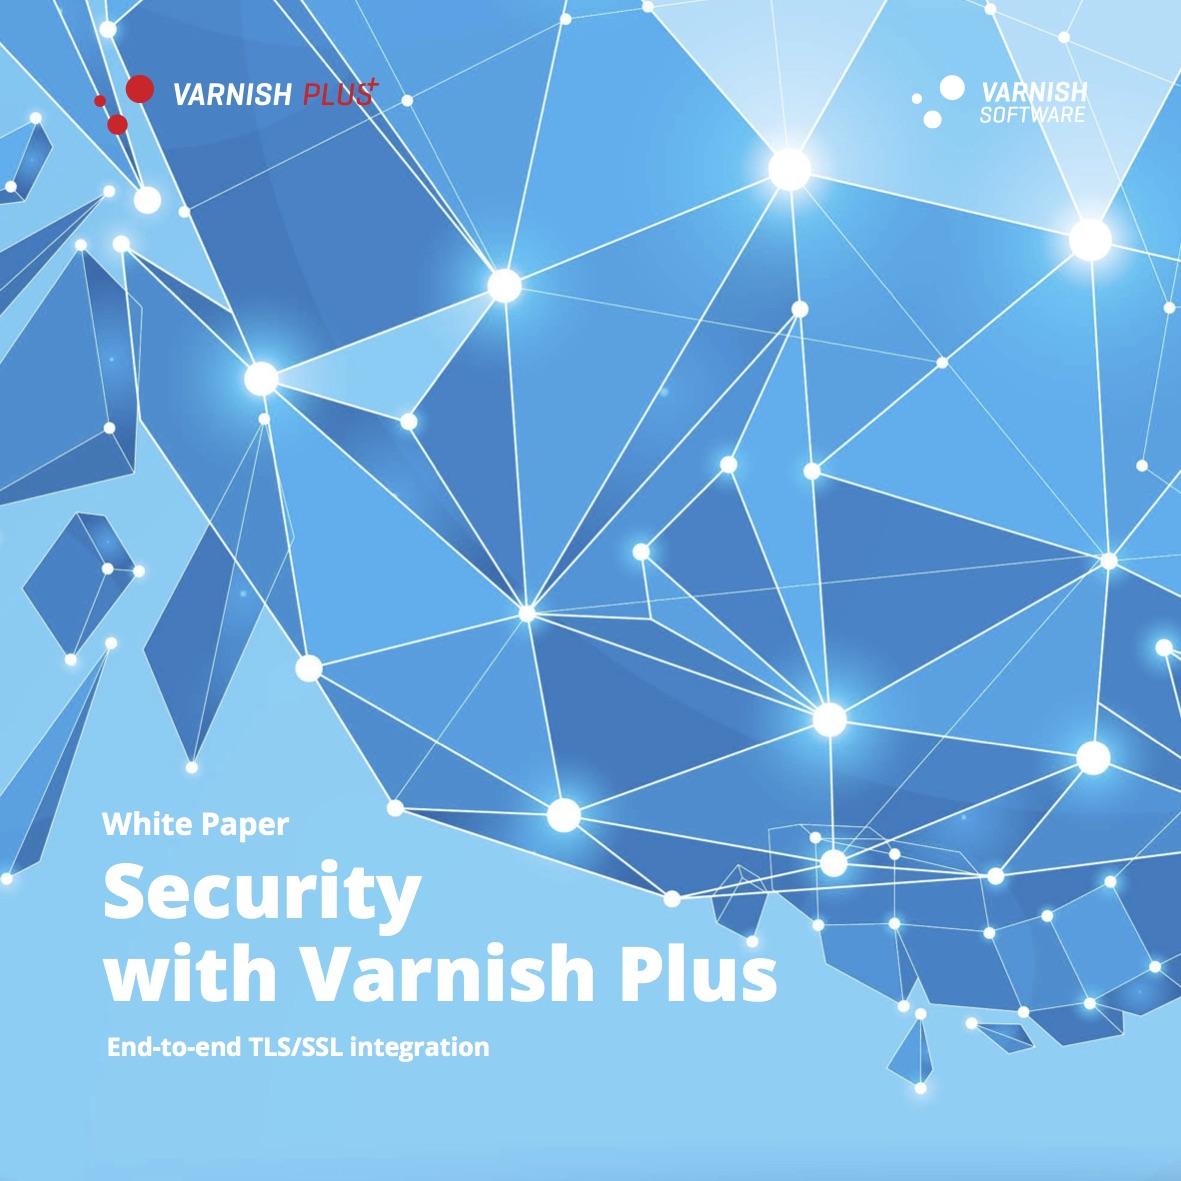 White_paper_Security_in_Varnish_Plus_SSL-TLS_Varnish_Software.jpg